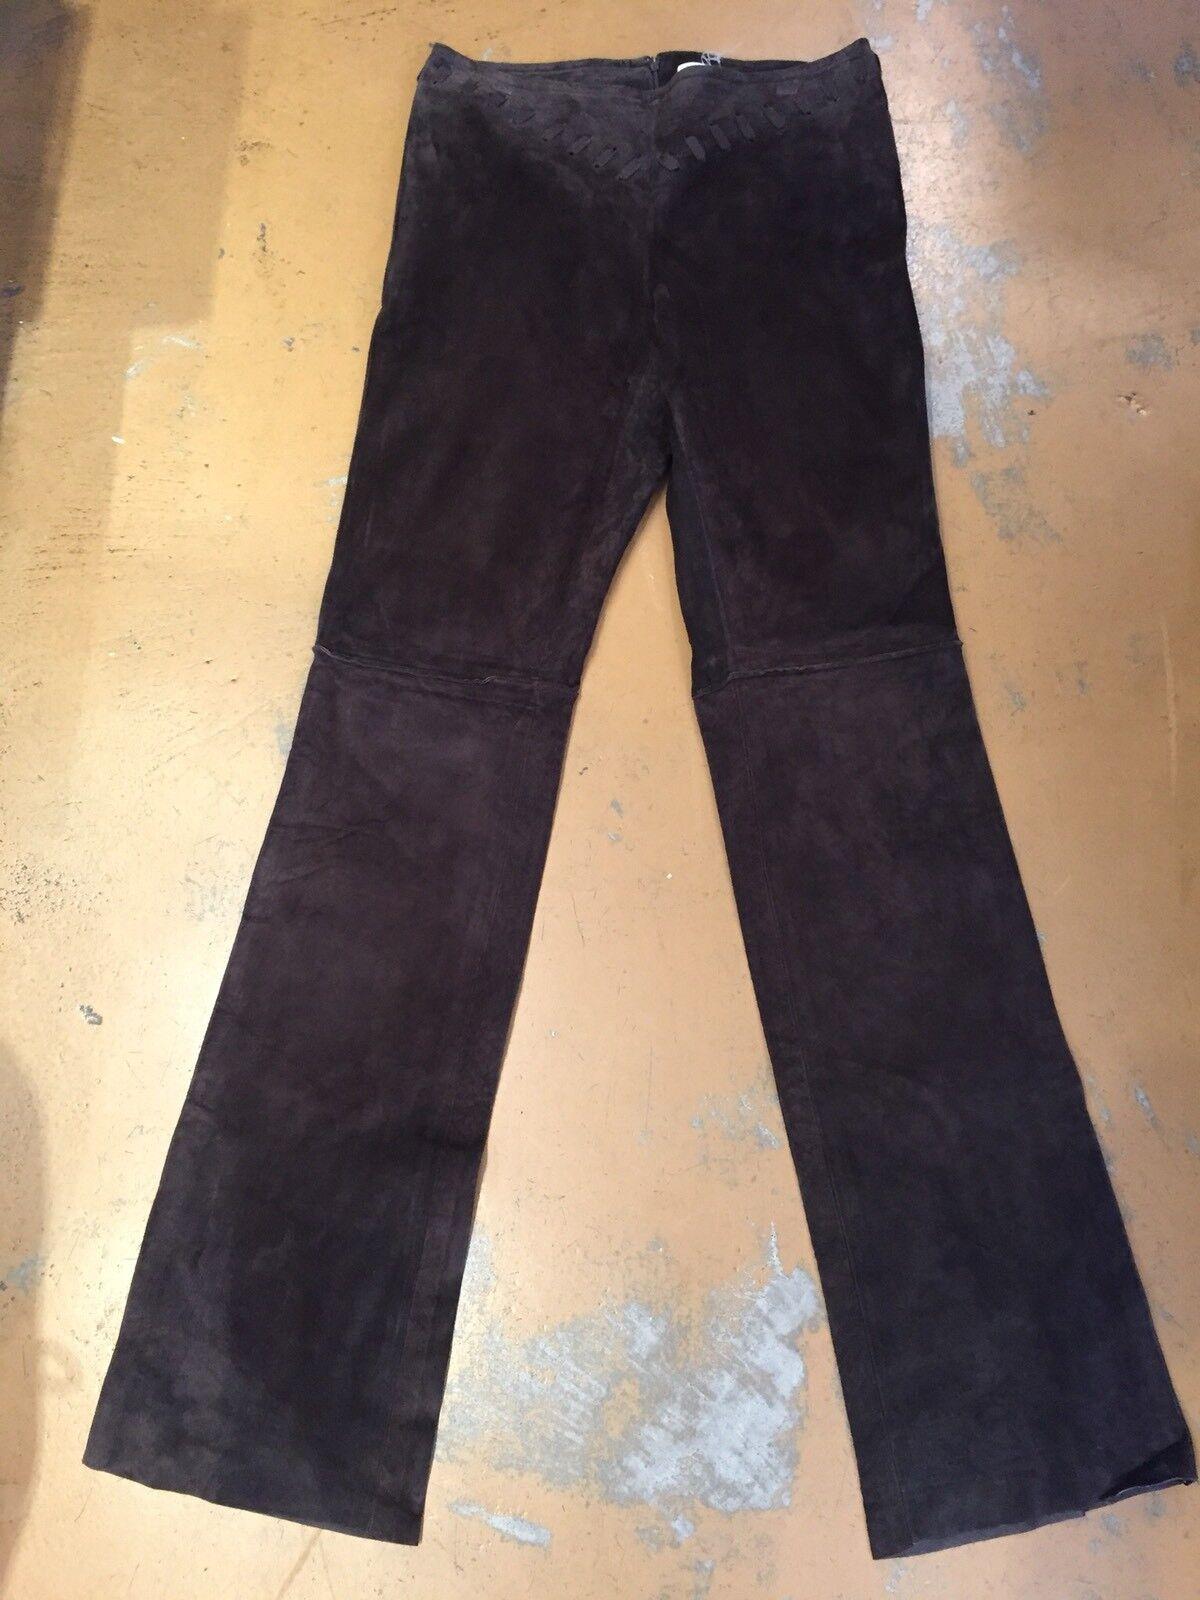 Illia NEW  Dark Brown Suede Leather Hi Rise Rear Zipper Pants Sz P NWOT